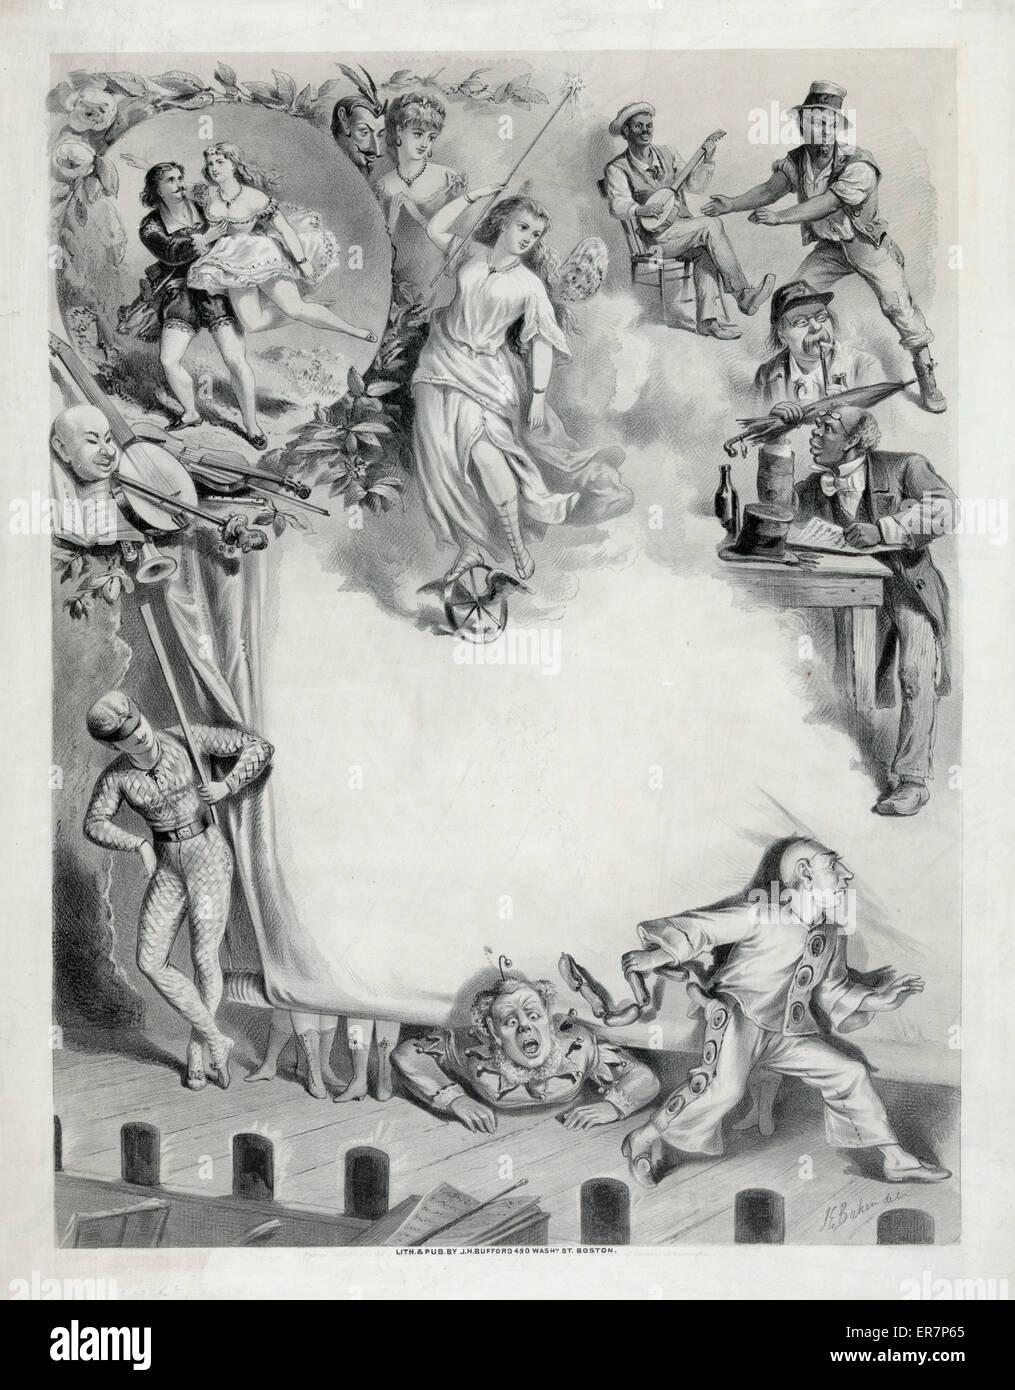 Leere Schautafel mit humorvollen Illustrationen. Datum c1872. Stockbild